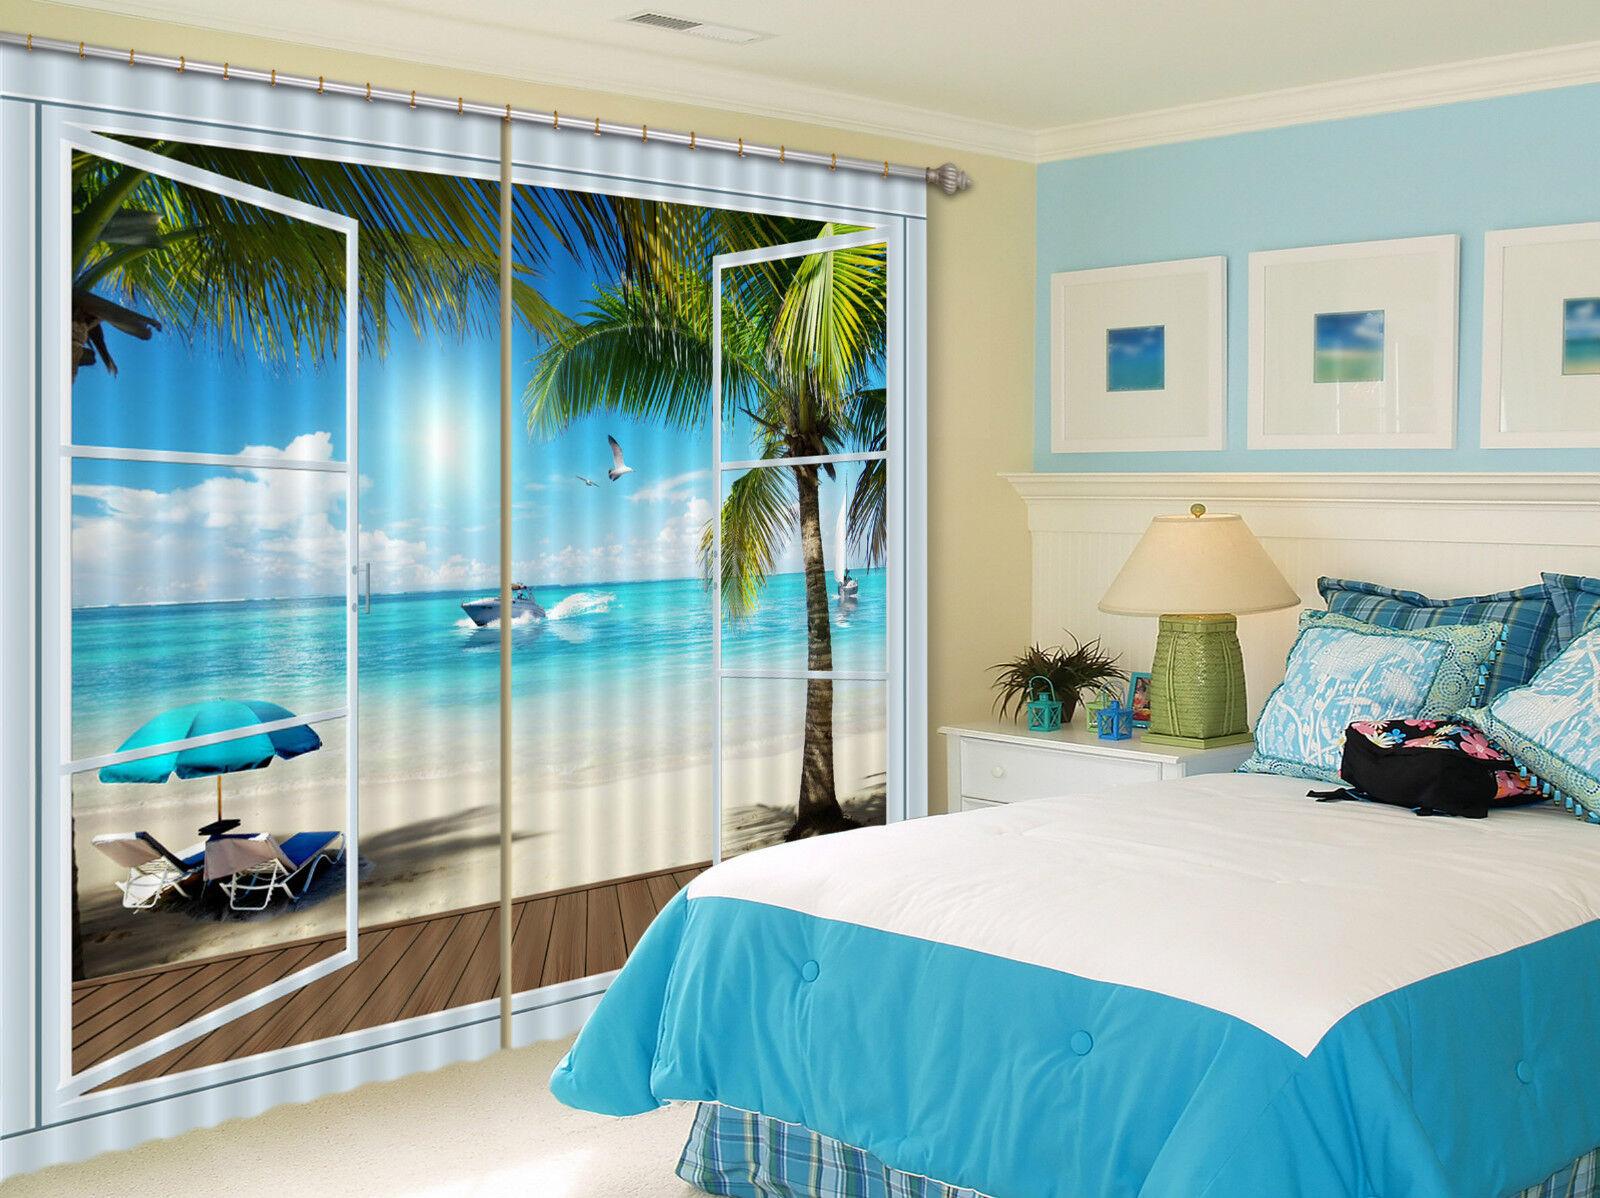 3D árboles mar 58 Cortinas de impresión de cortina de foto Blockout Tela Cortinas Ventana CA